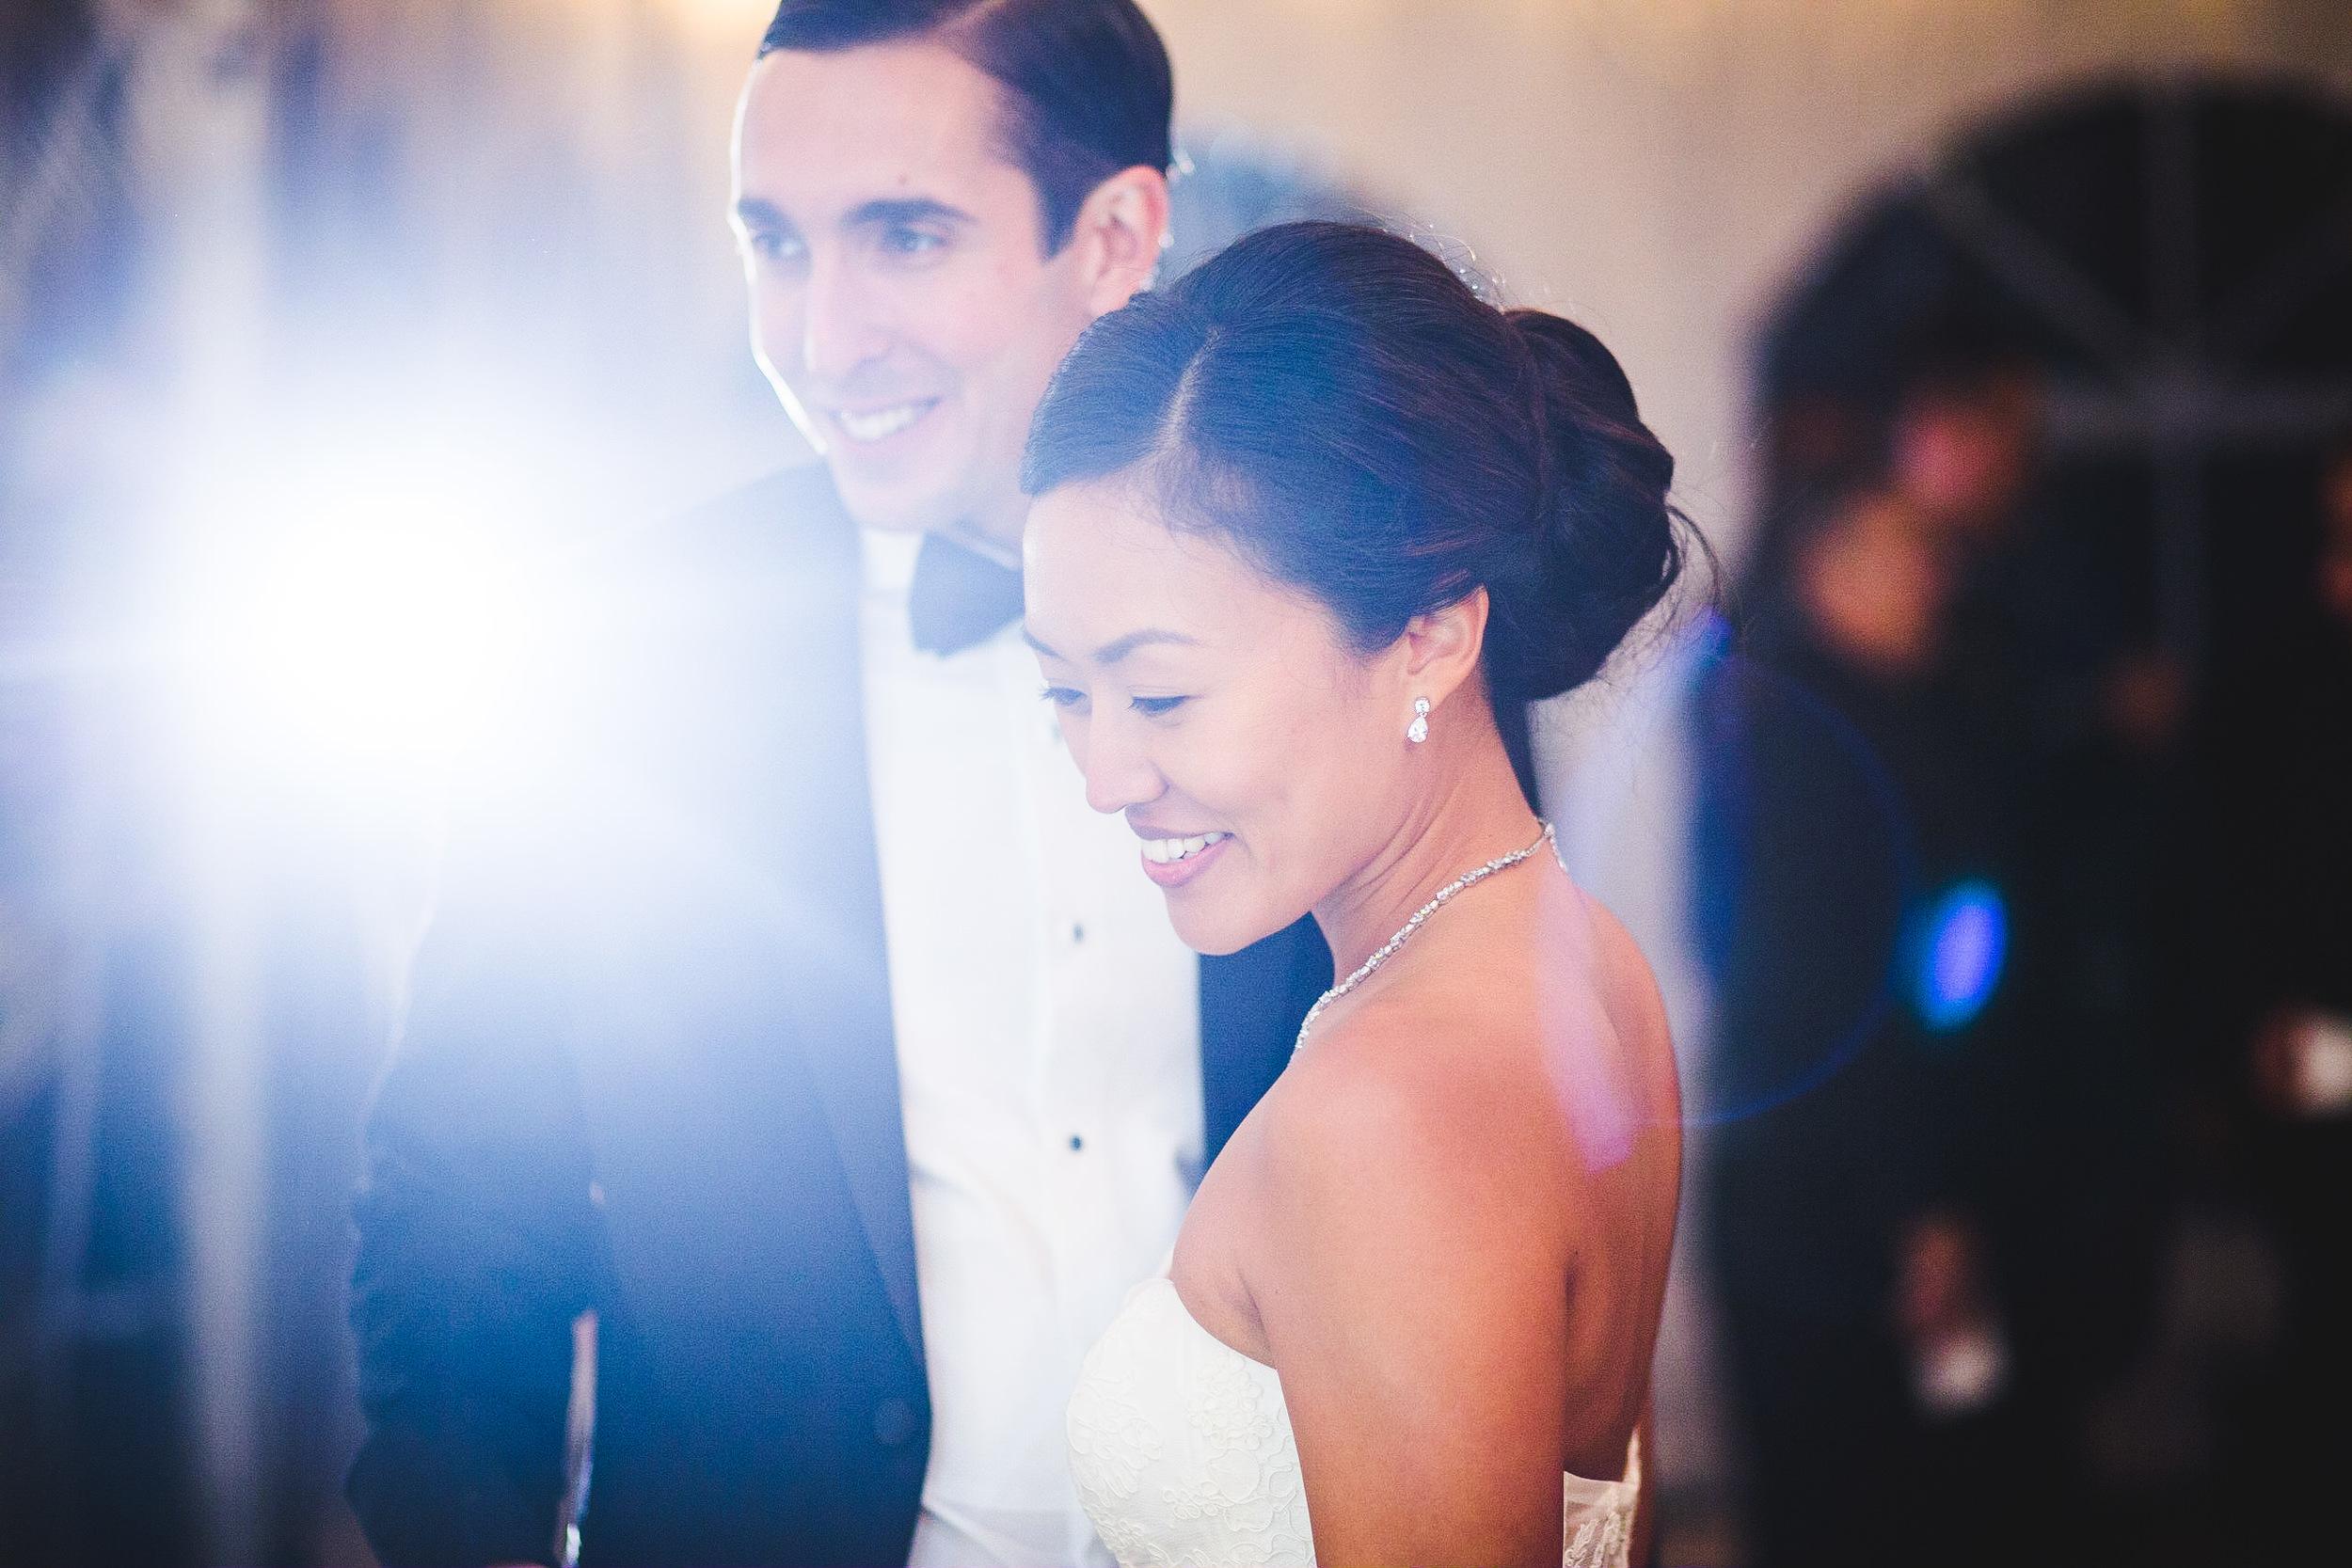 Wedding at Woodlawn Manor Sandy Spring Maryland by Mantas Kubilinskas-28.jpg